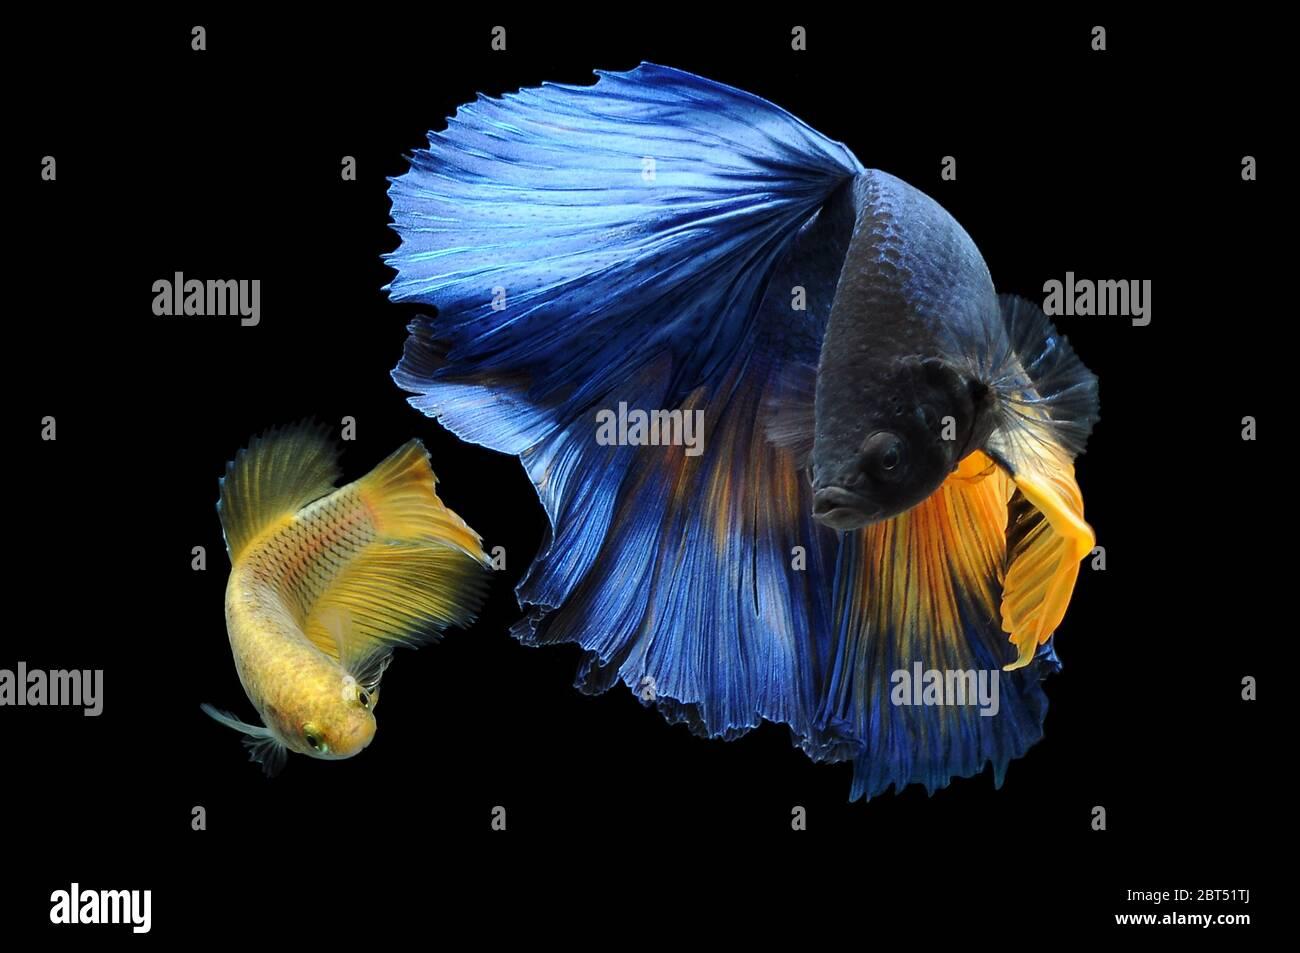 Two betta fish swimming in an aquarium Stock Photo